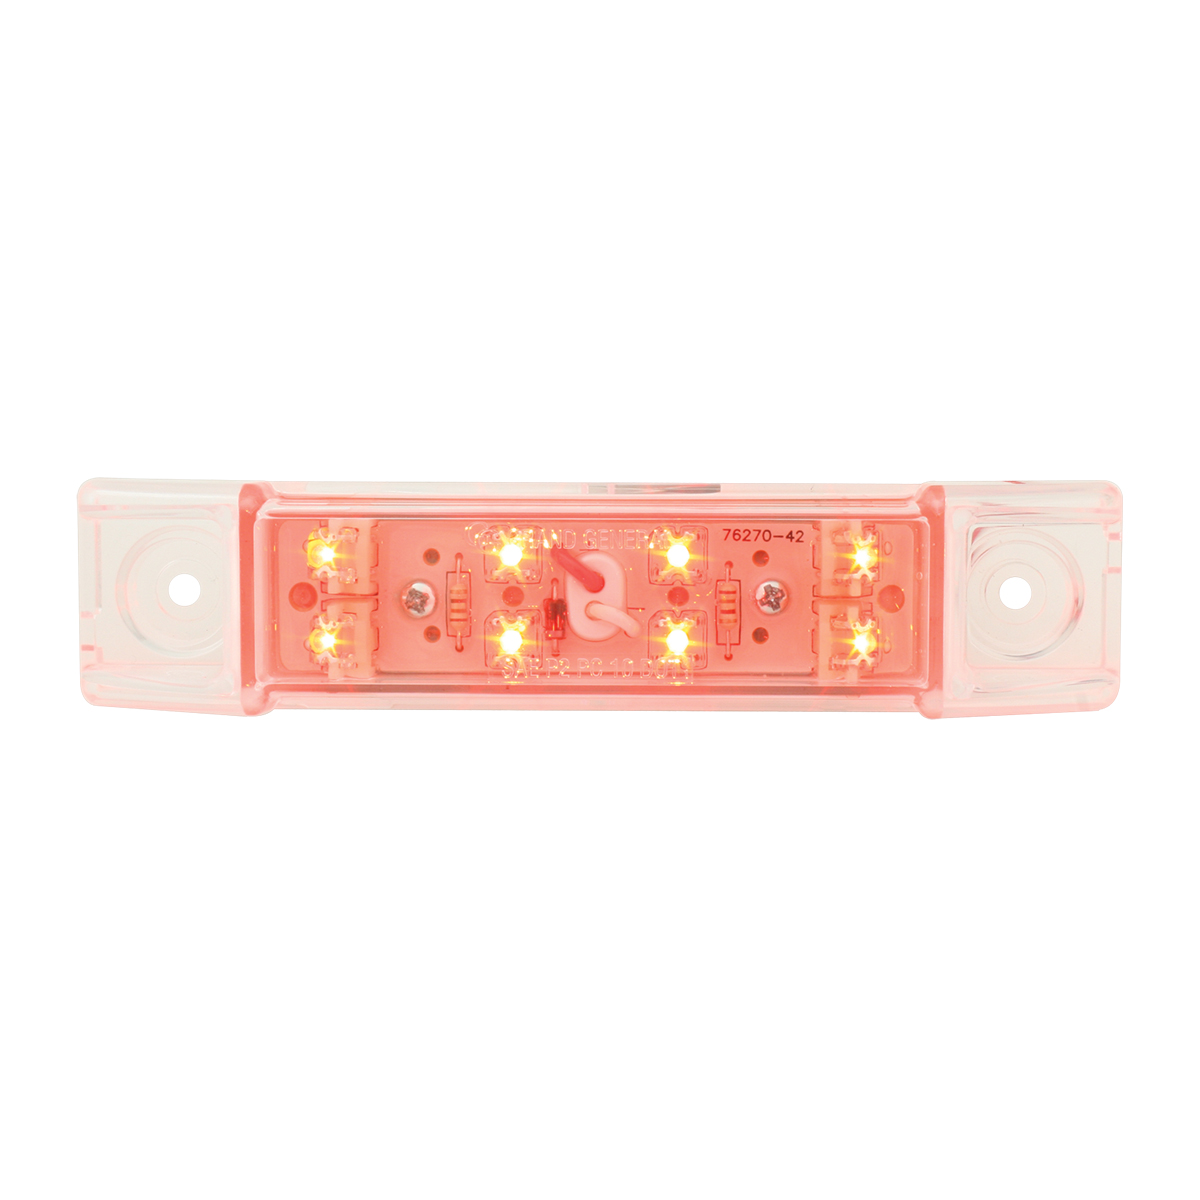 75173 Rectangular Wide Angle Dual Function LED Light